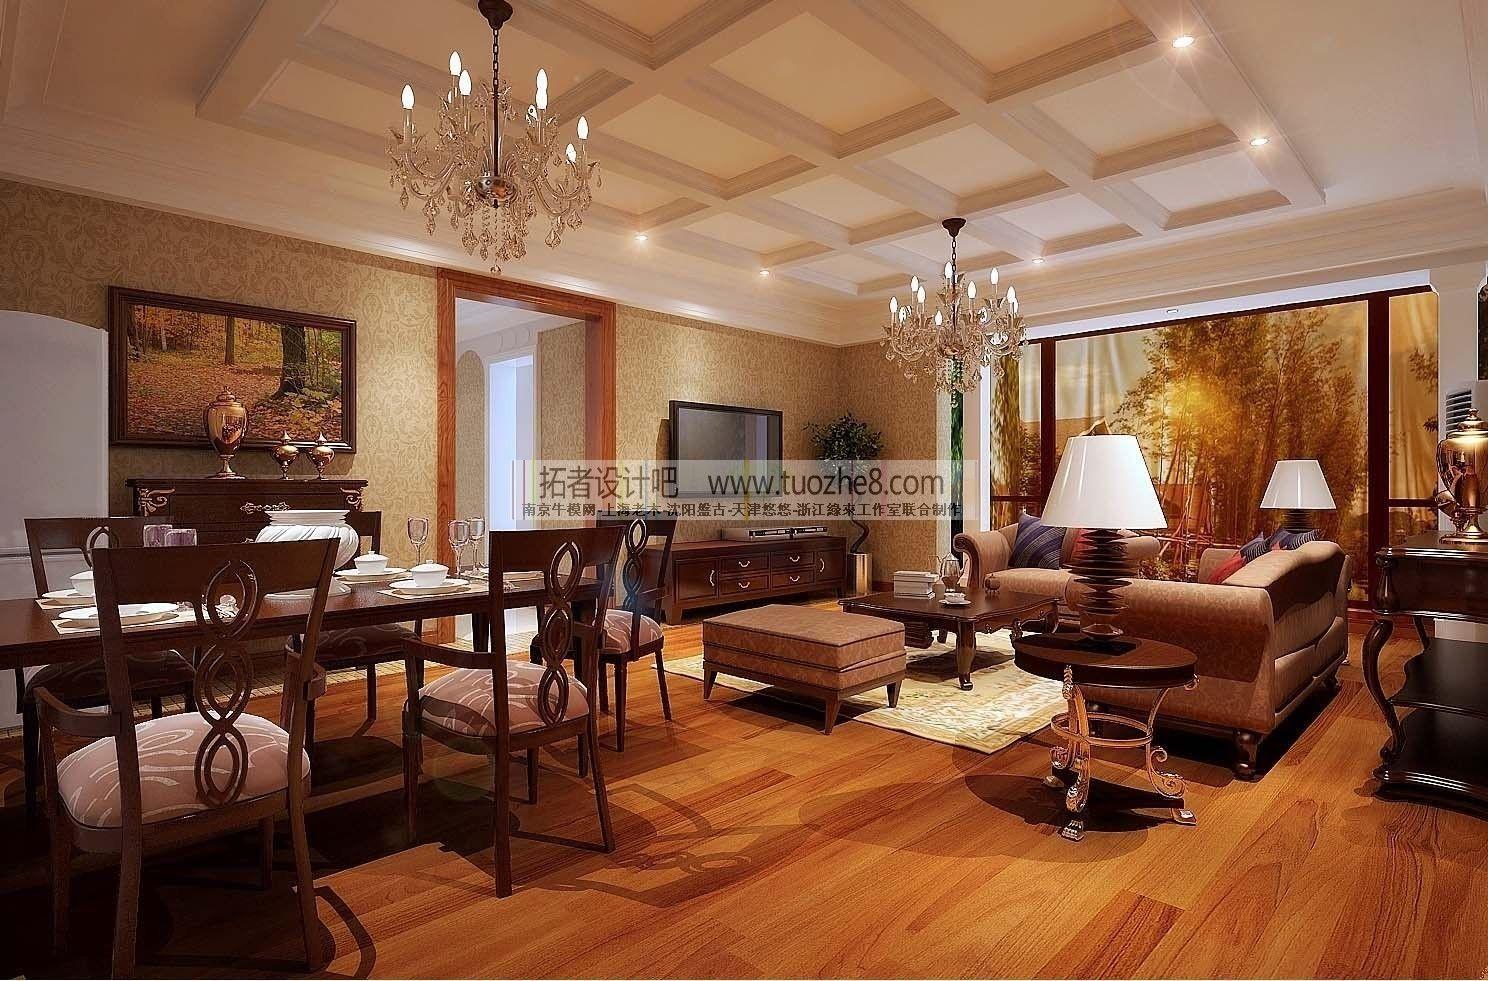 Stylish Interior Design Living Room Restau 3d Model